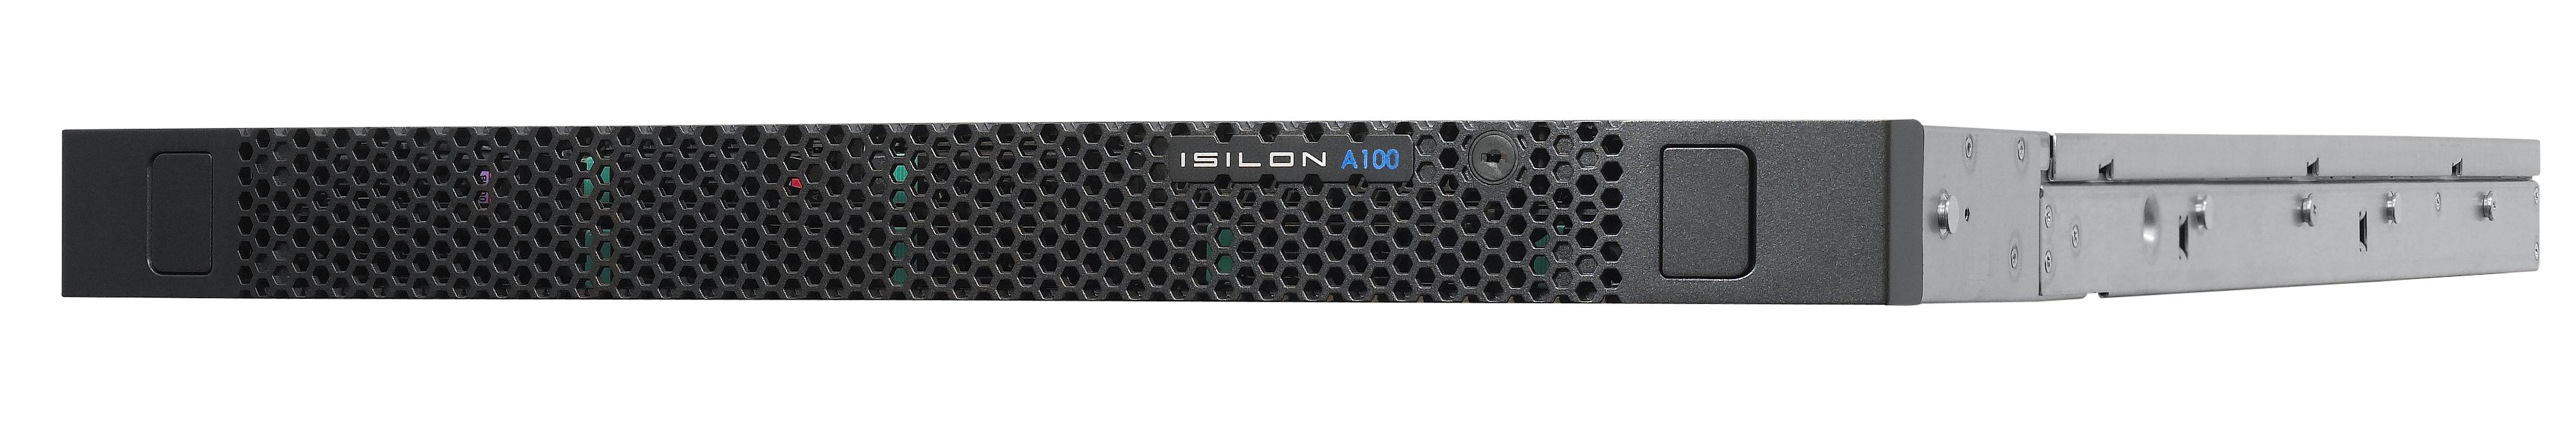 Isilon-Accelerator-Node-A100